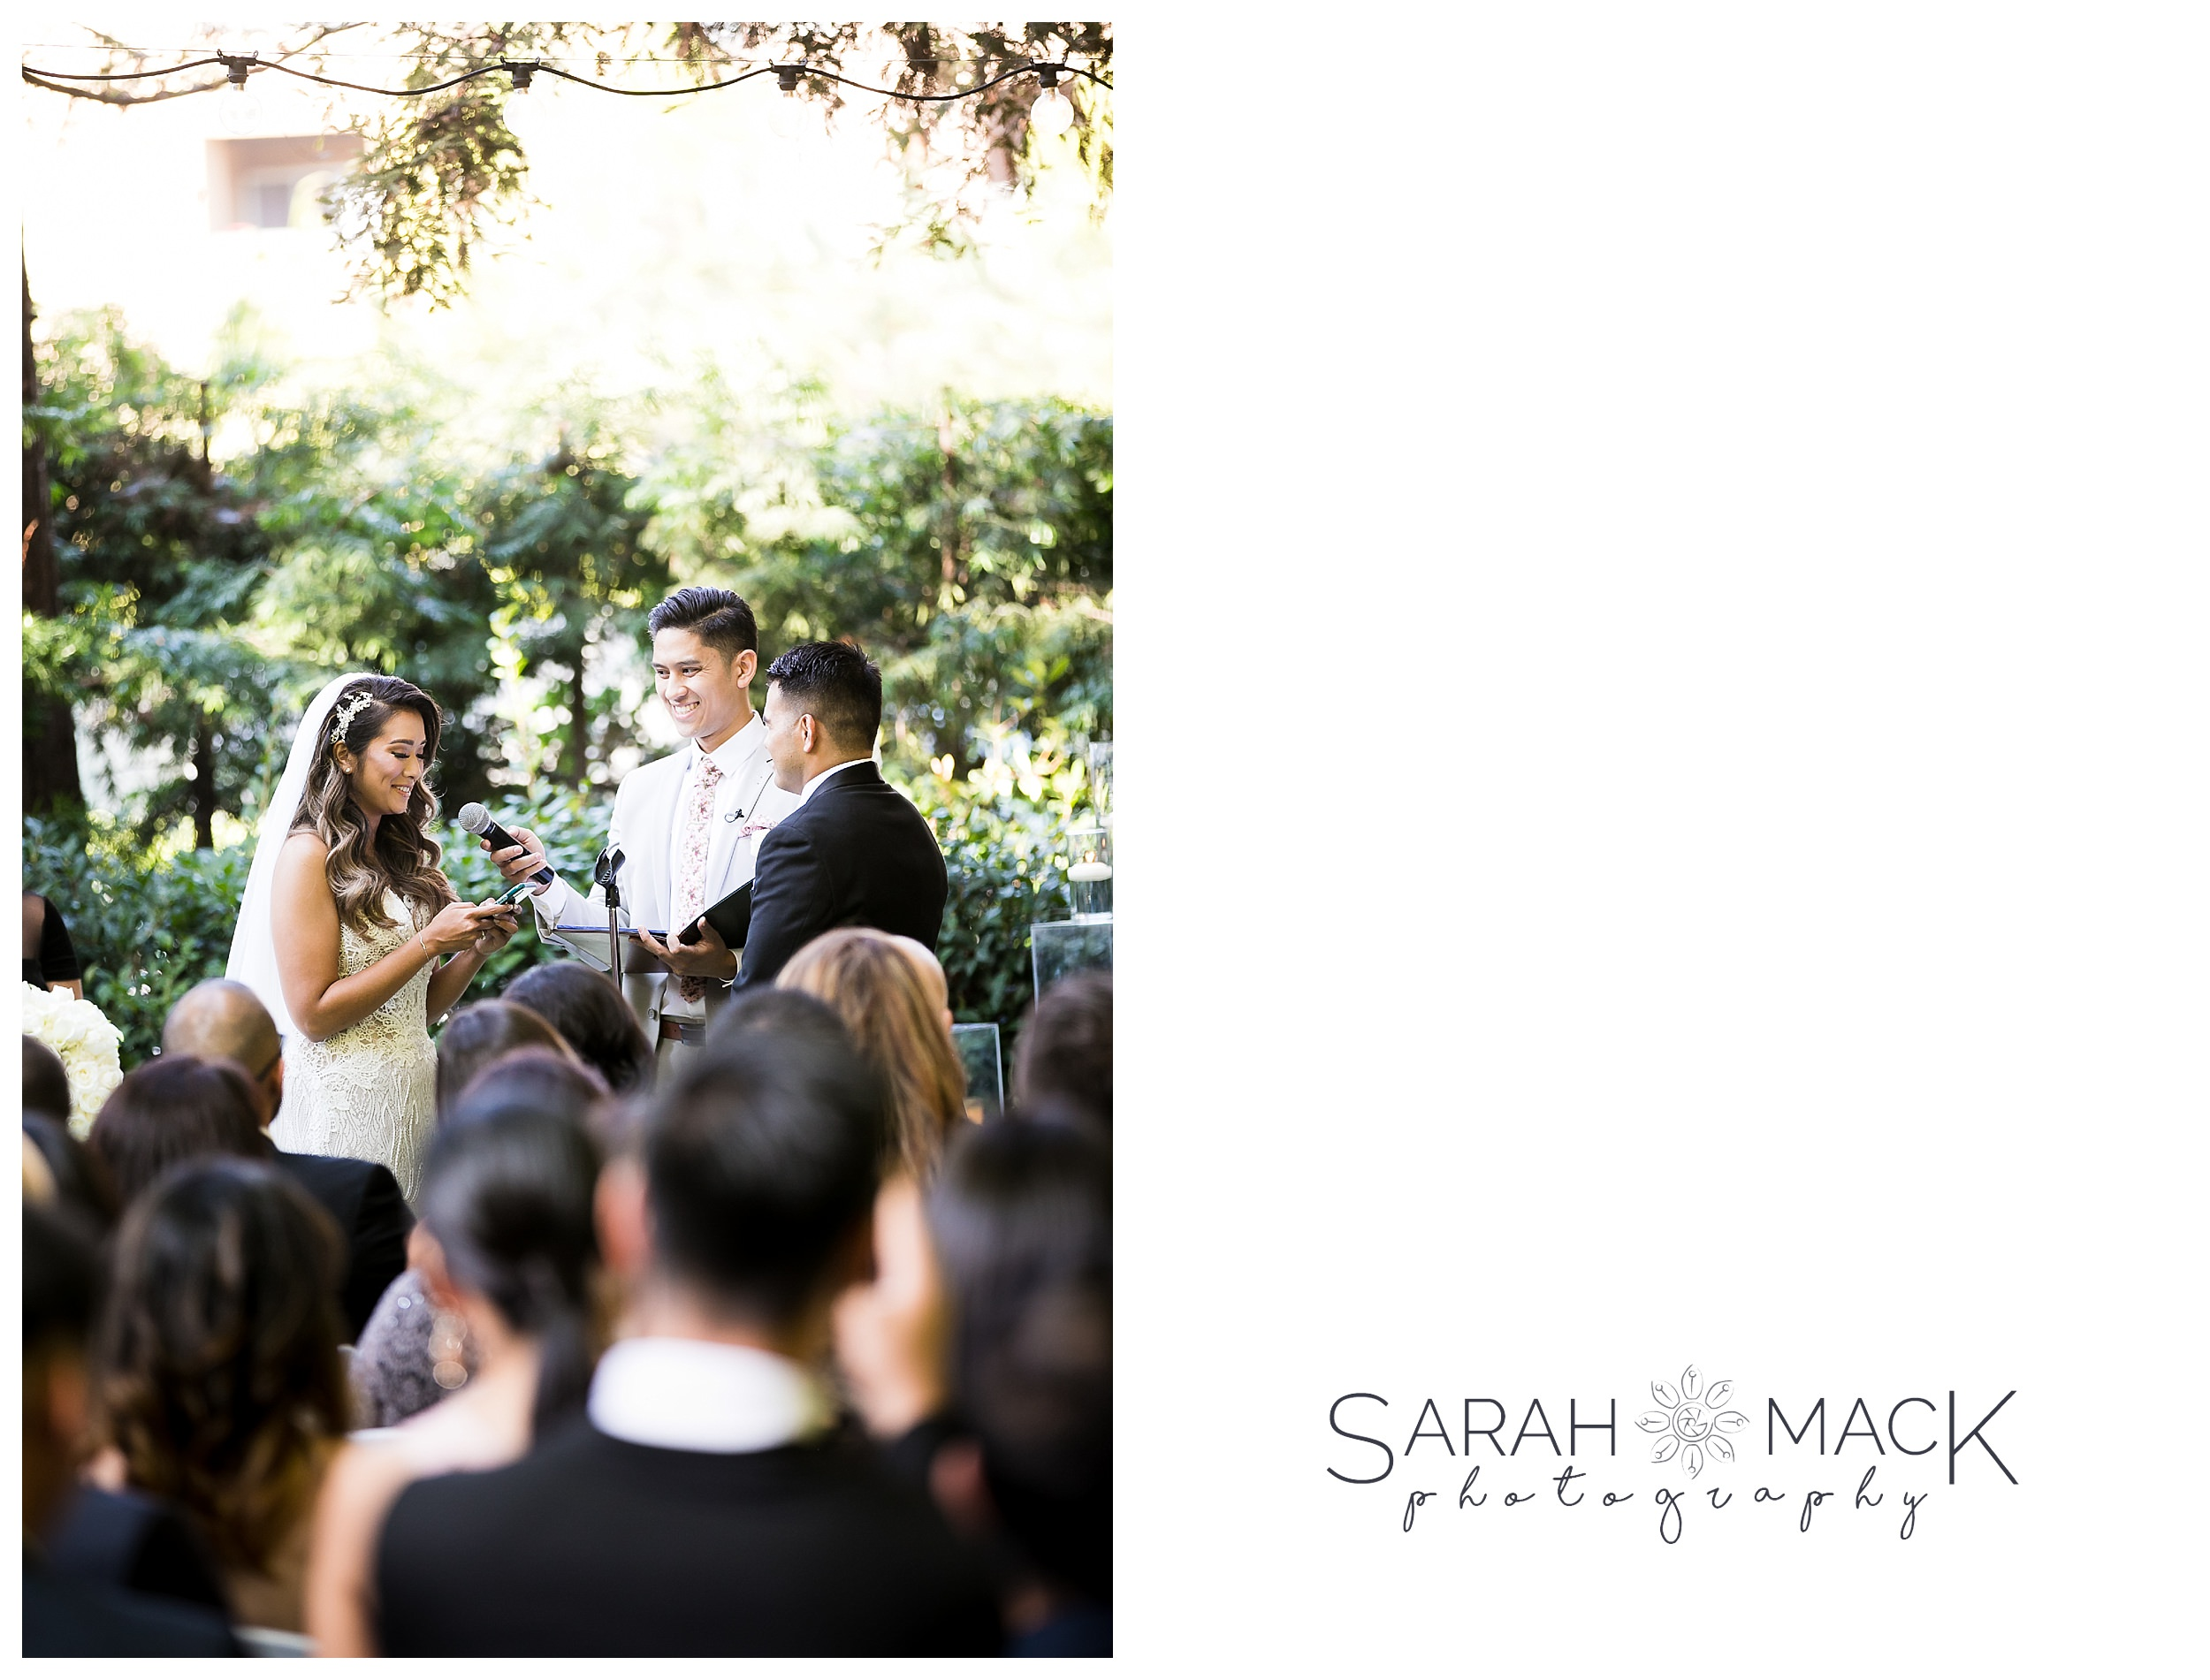 LE-Avenue-of-the-Arts-Costa-Mesa-Wedding-Photography-0152.jpg